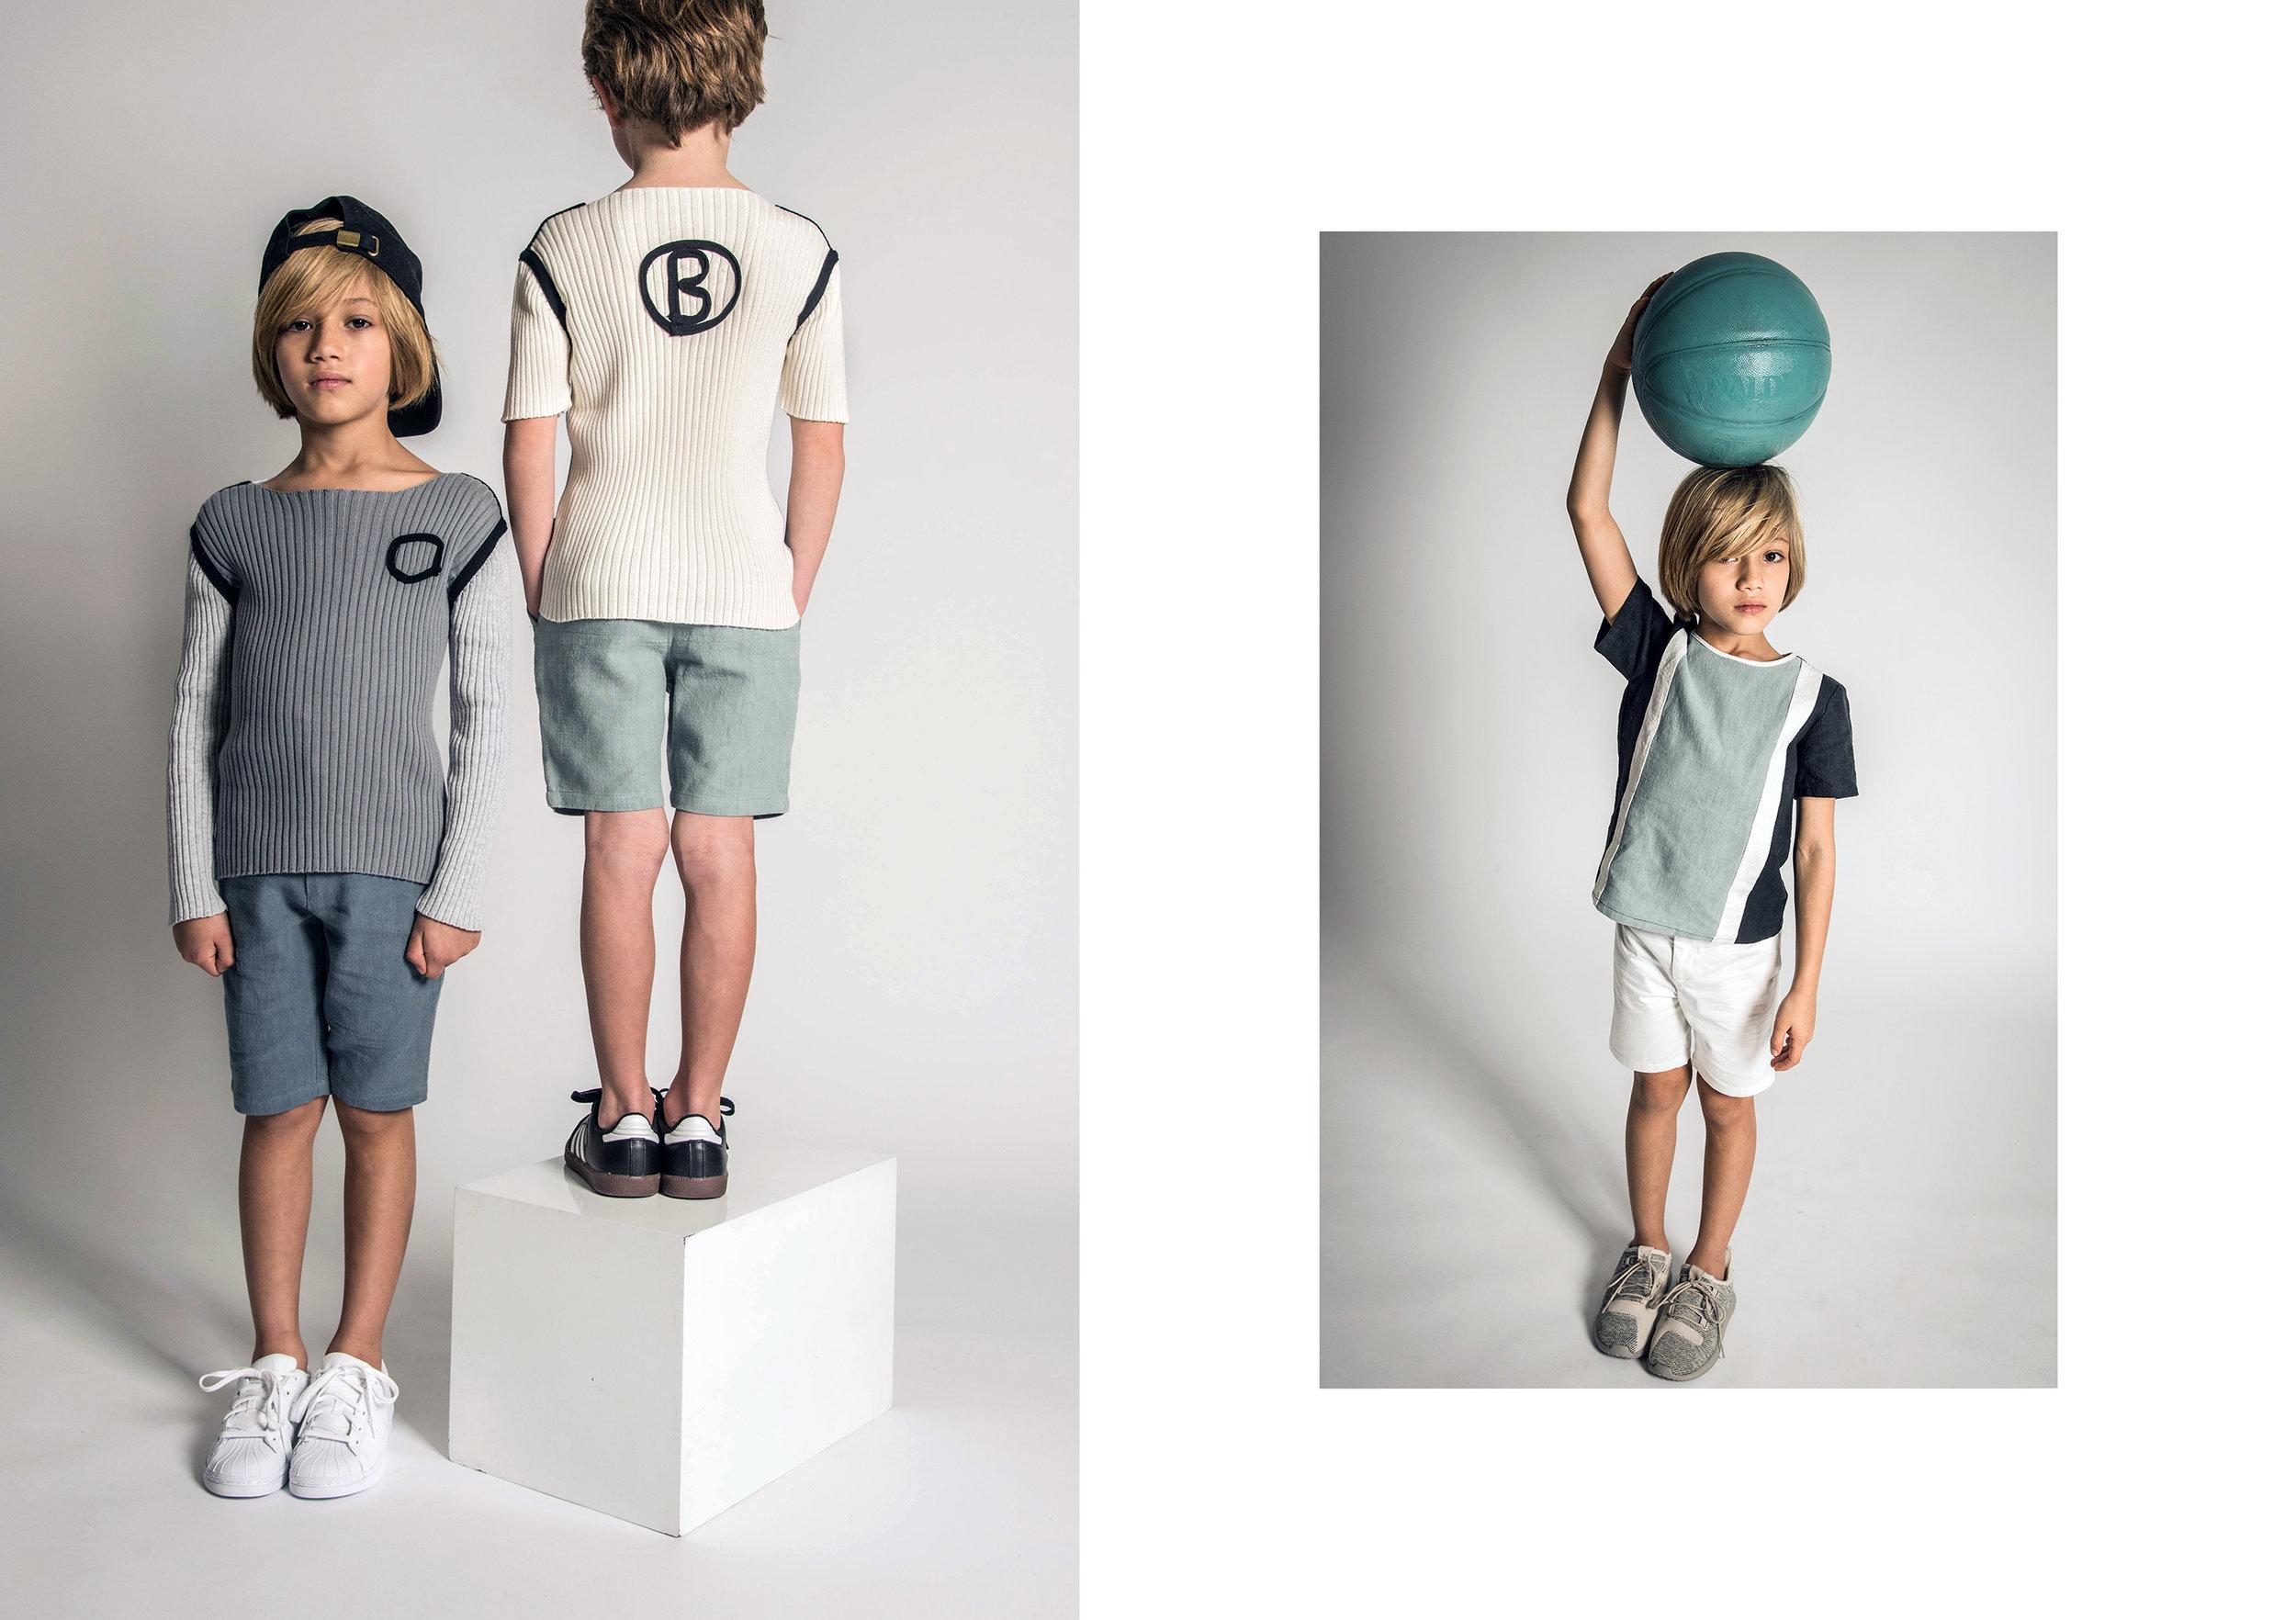 Boys Adele cap + Andrew head ball b-491.jpg